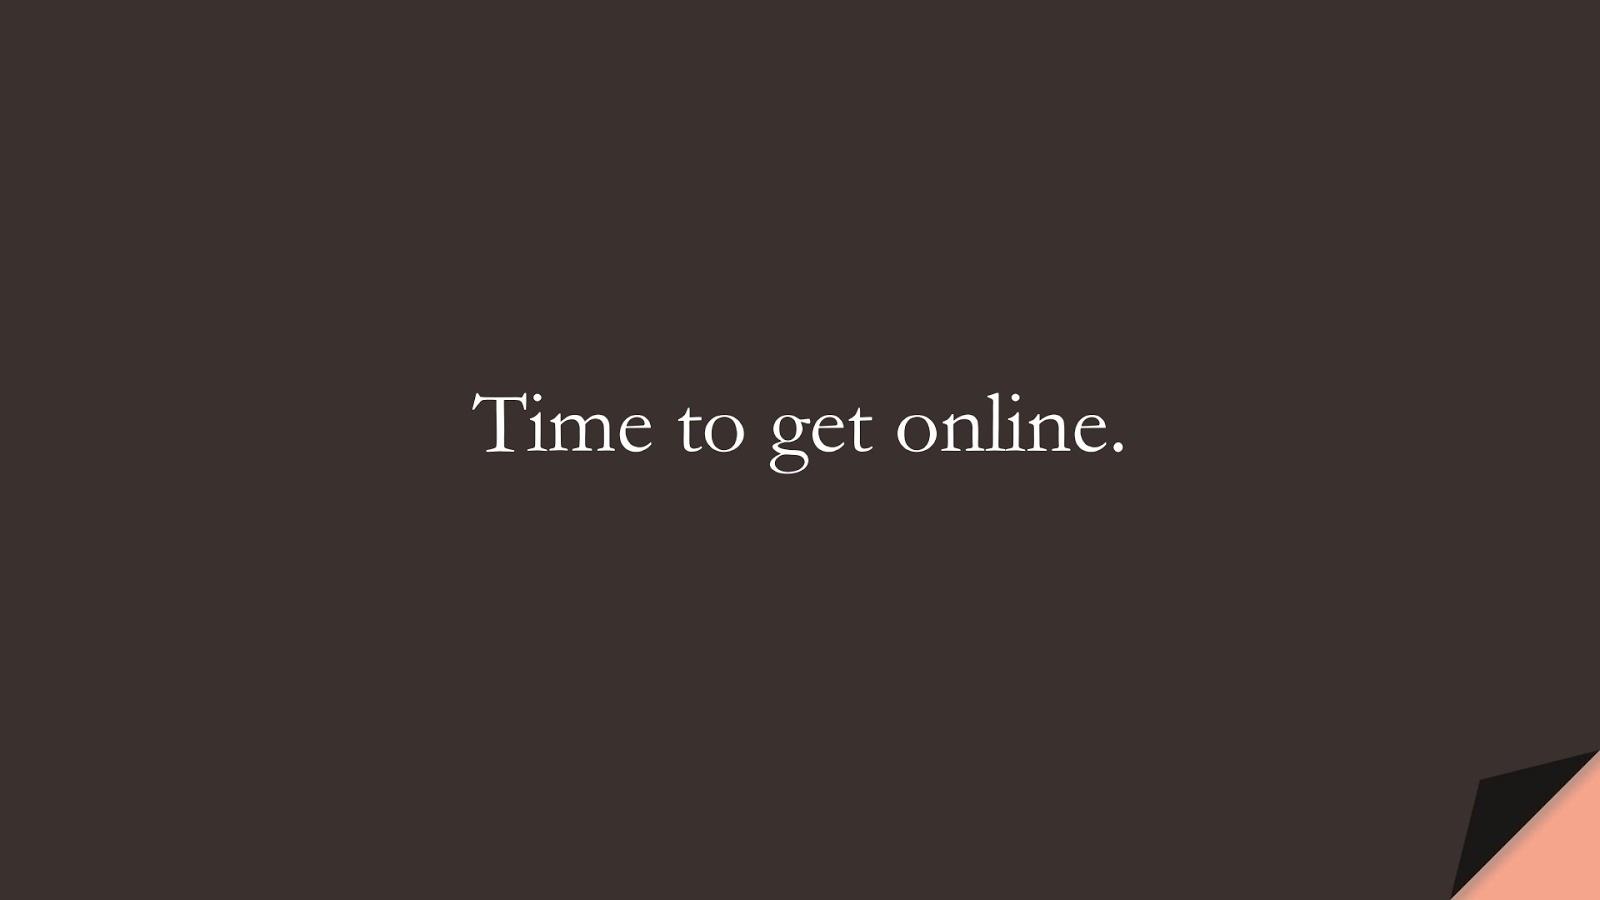 Time to get online.FALSE